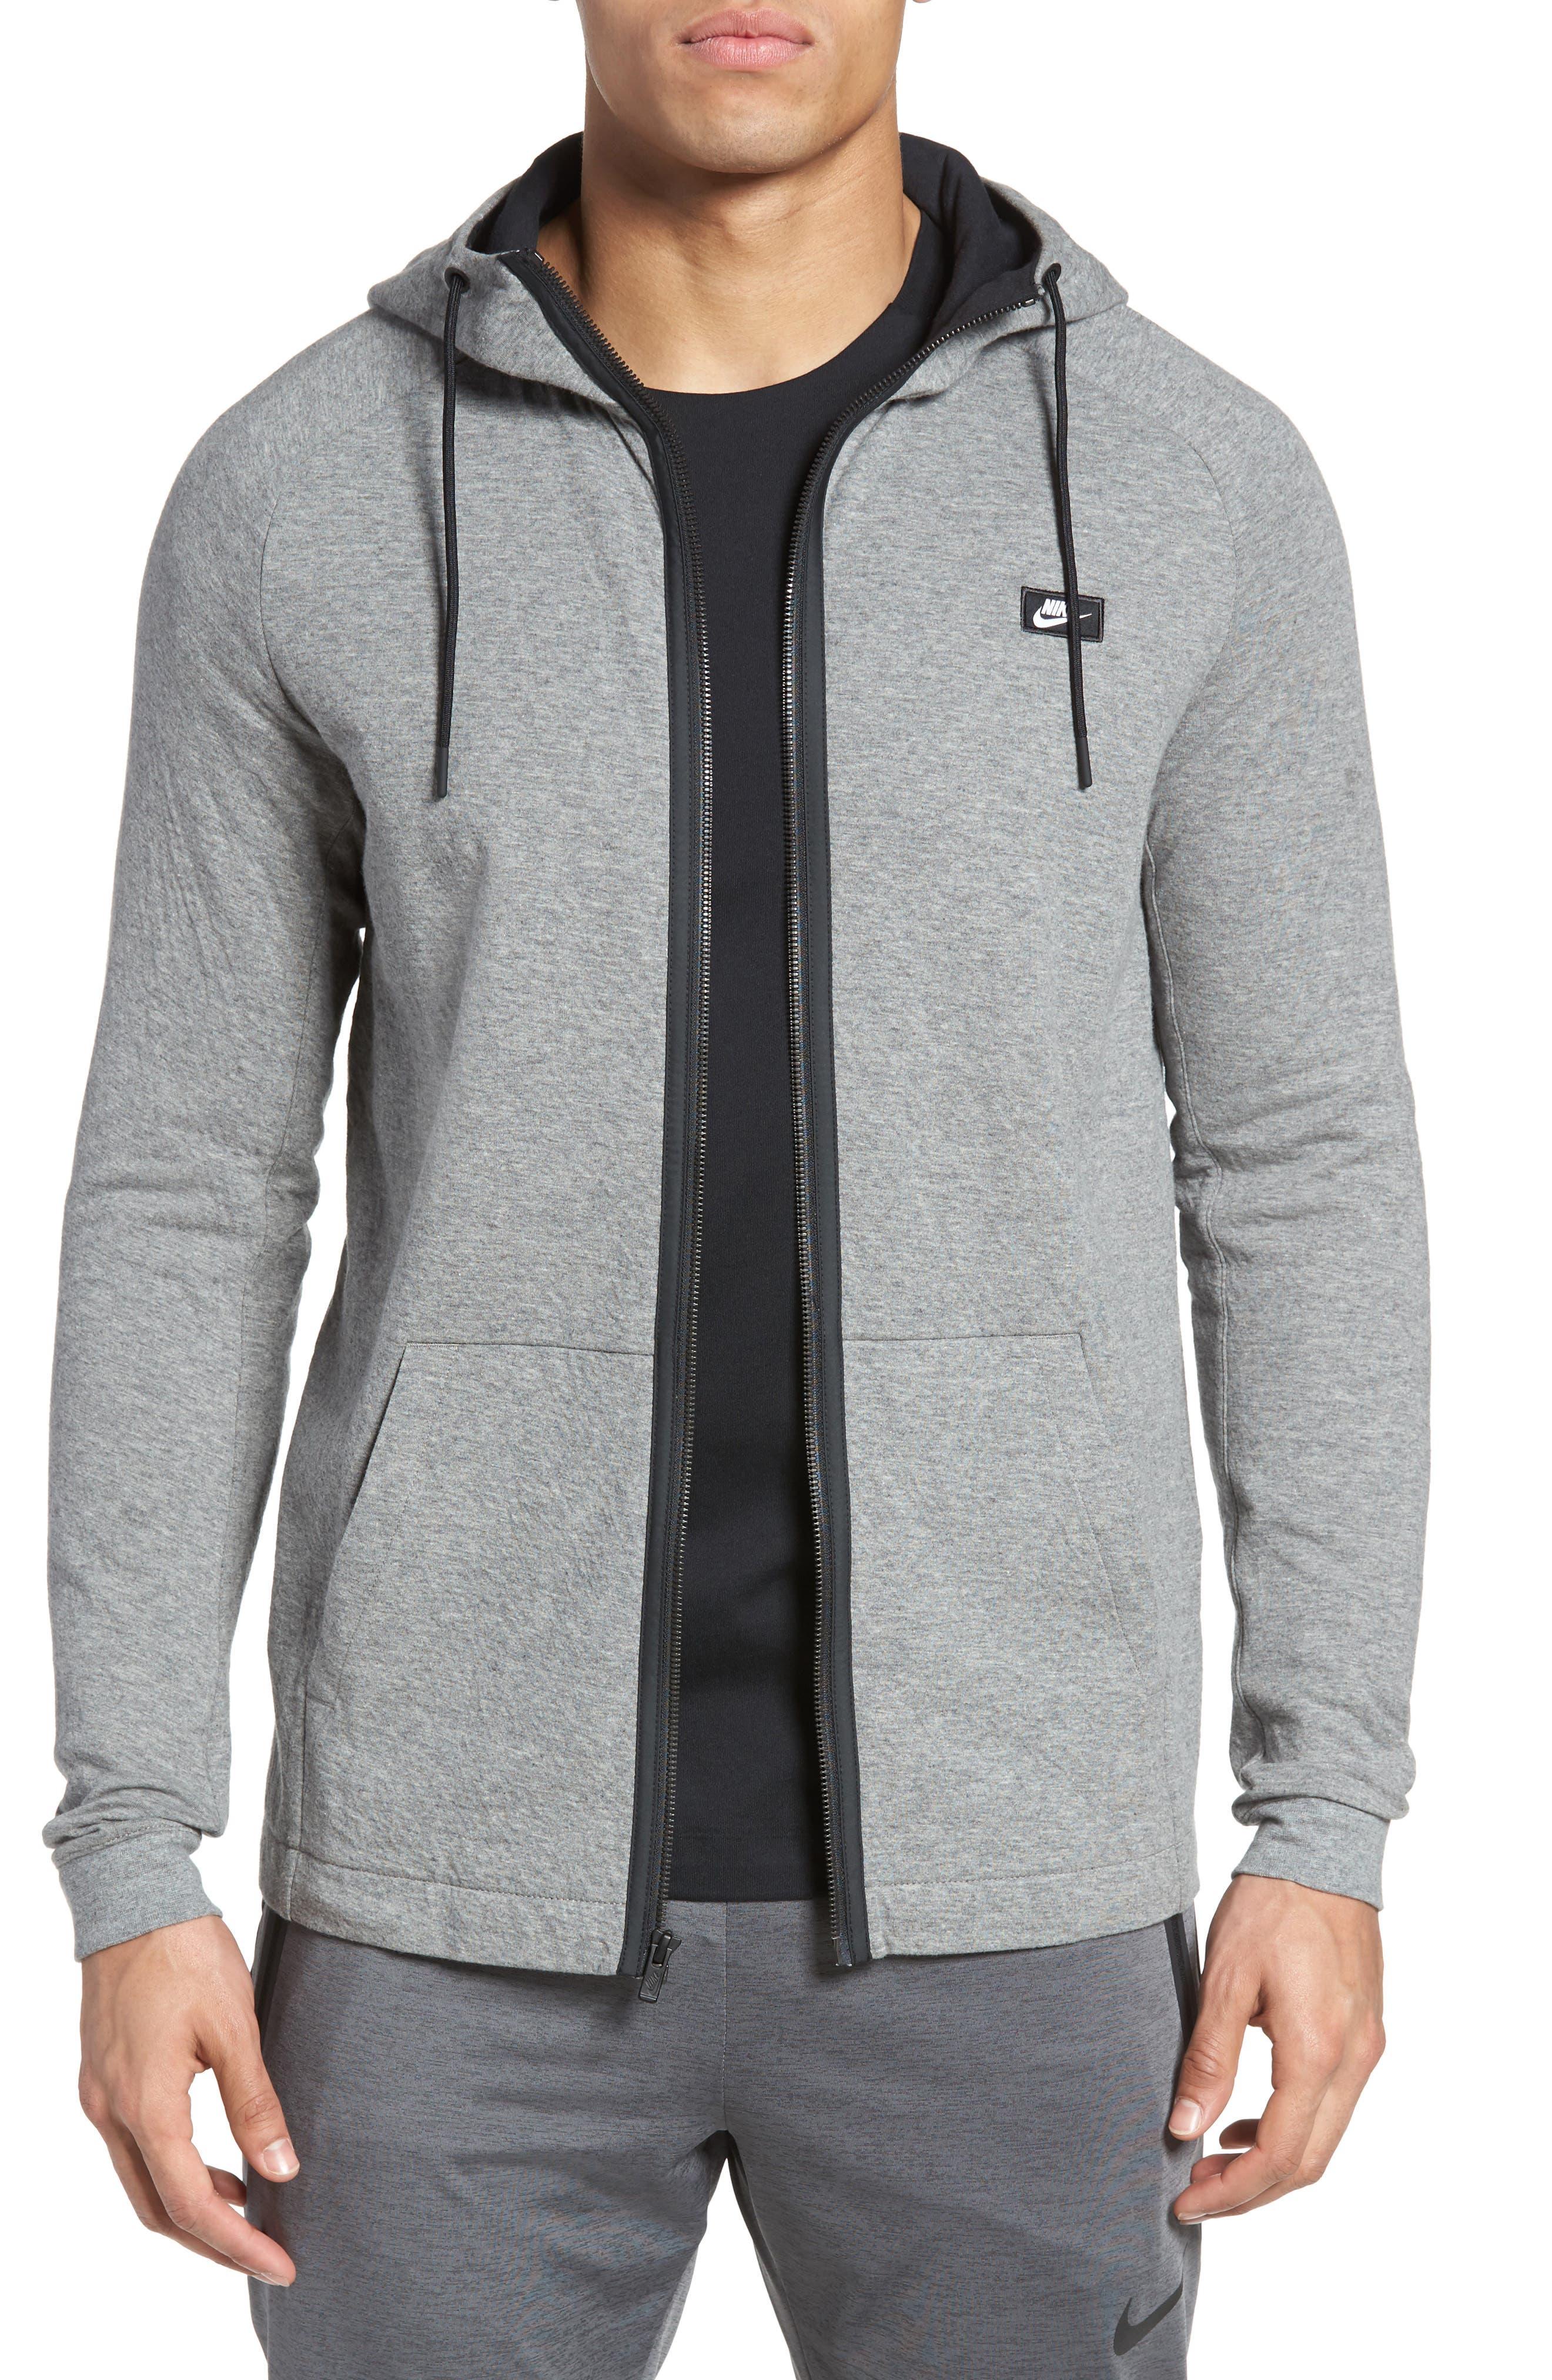 NIKE, Tech Regular Fit Fleece Hoodie, Main thumbnail 1, color, CARBON HEATHER/BLACK